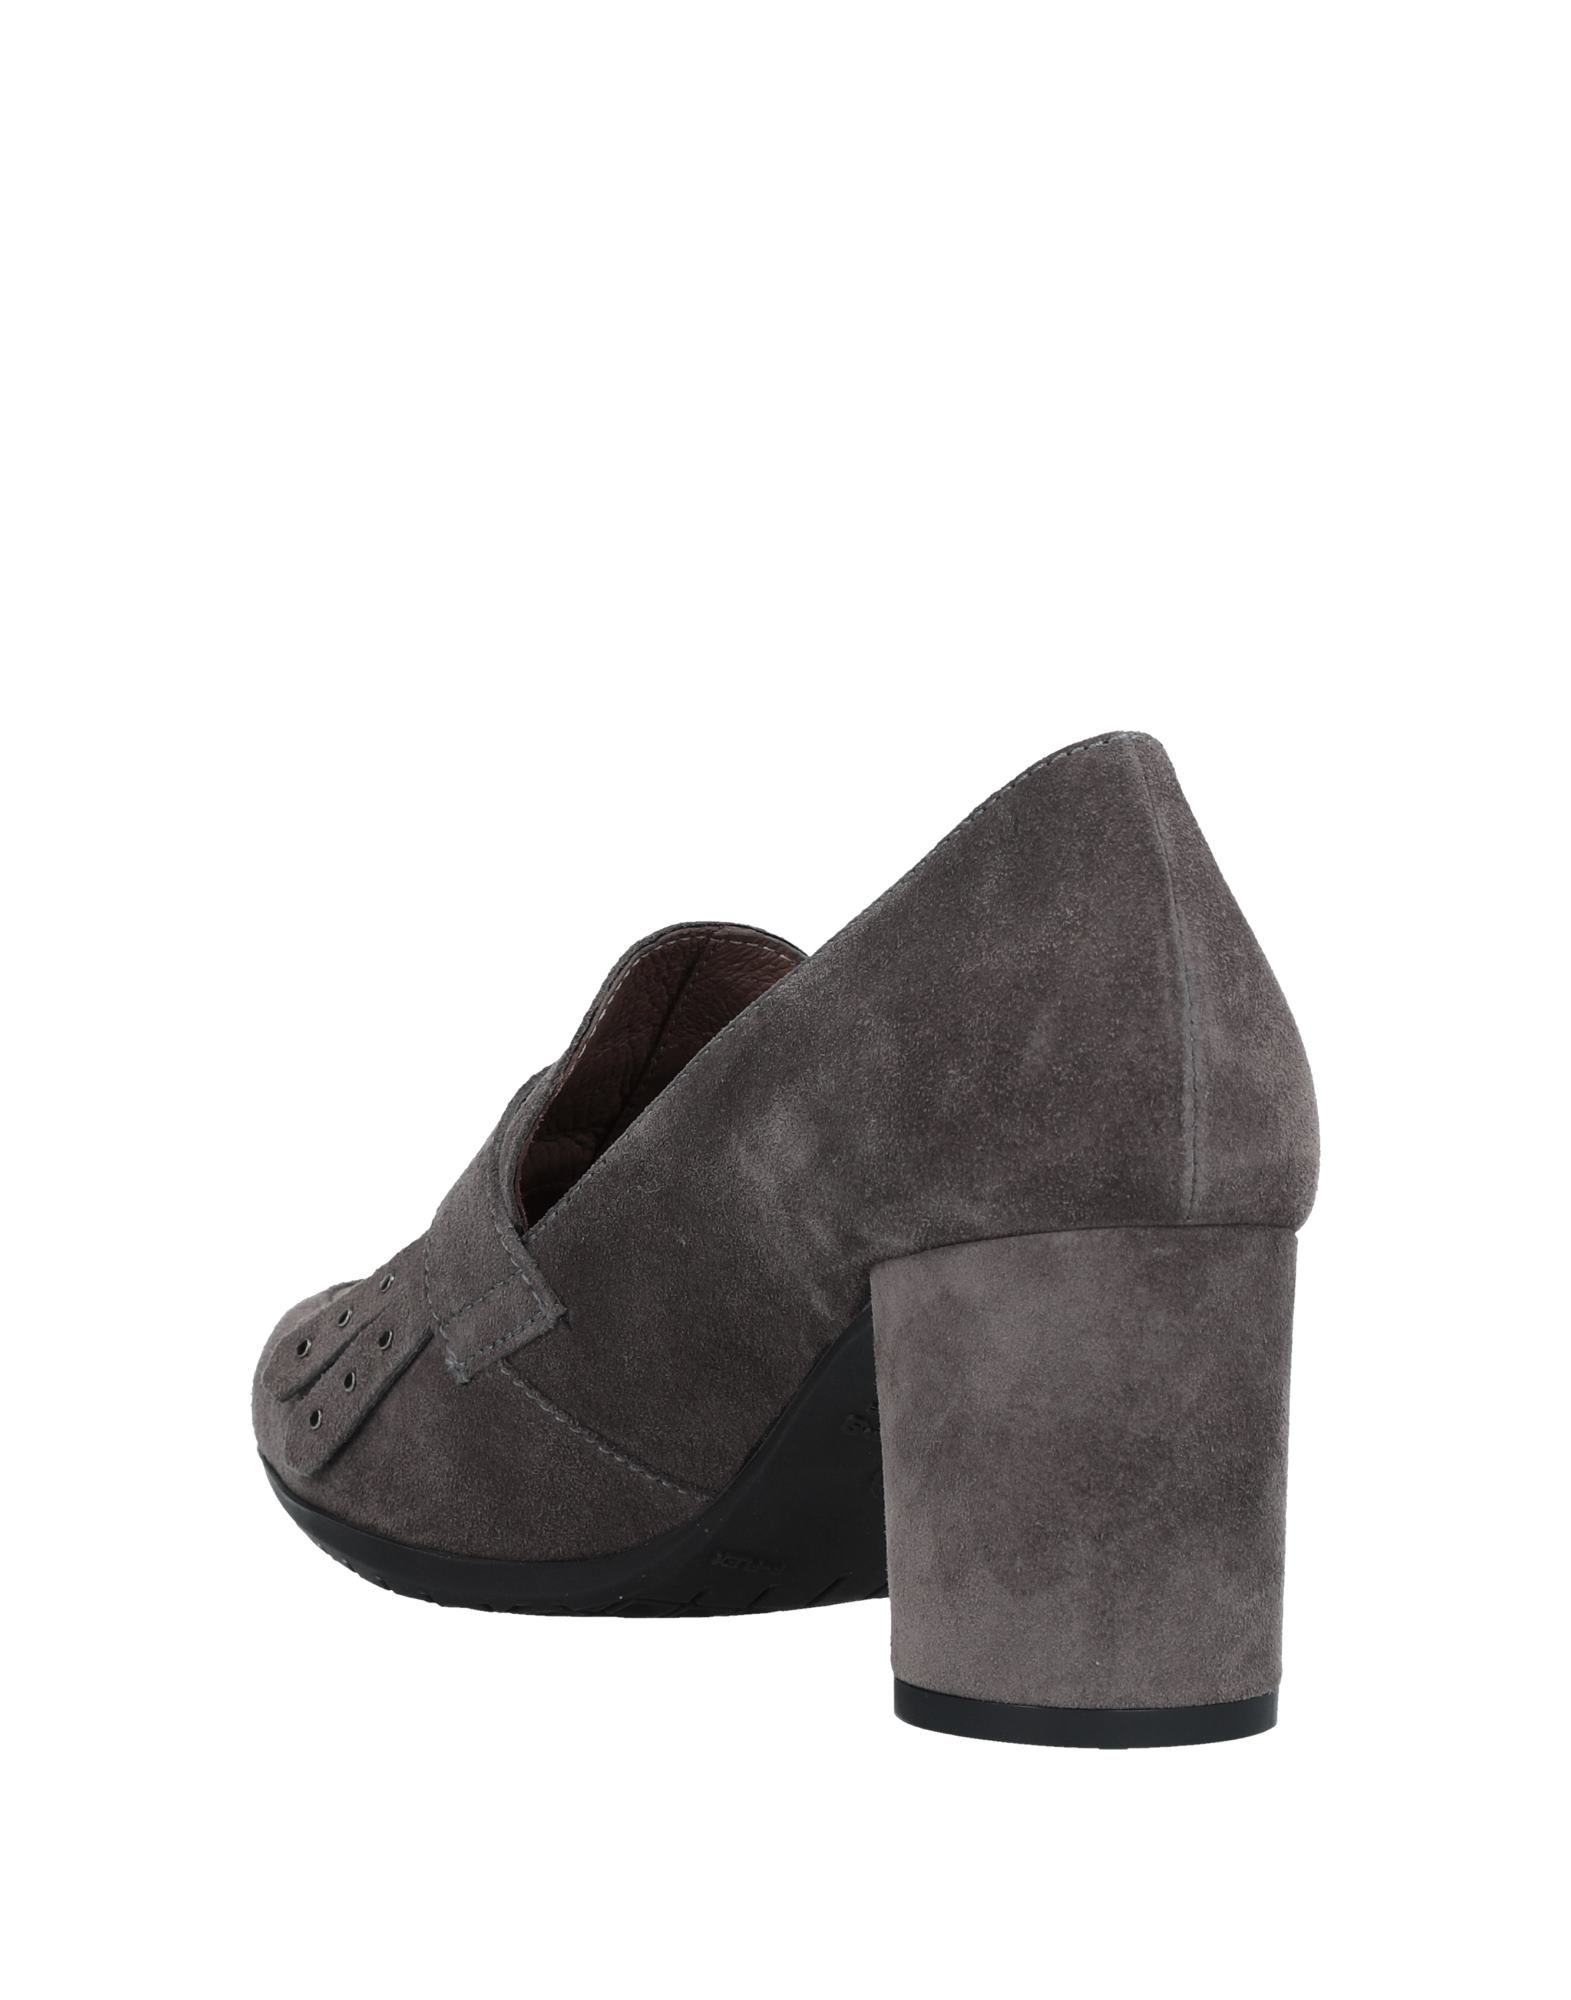 Wonders Mokassins Damen  11532634UB Gute Qualität beliebte Schuhe